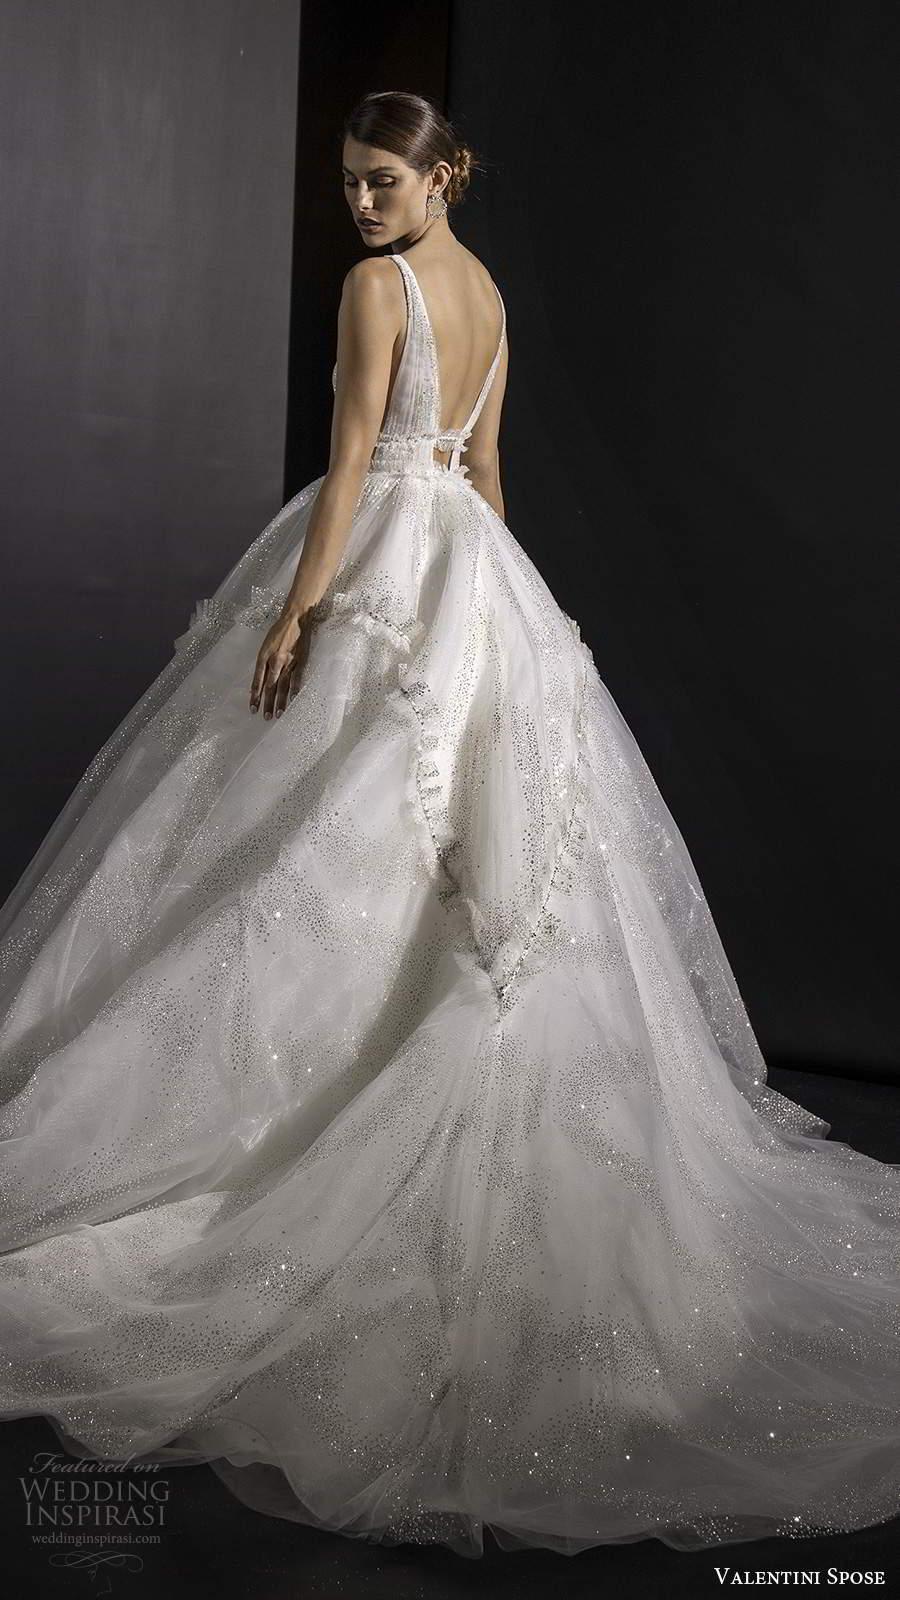 valentini spose fall 2020 bridal sleeveless straps plunging v neckline ruched bodice fully embellished glitzy a line ball gown wedding dress v back chapel train (8) bv